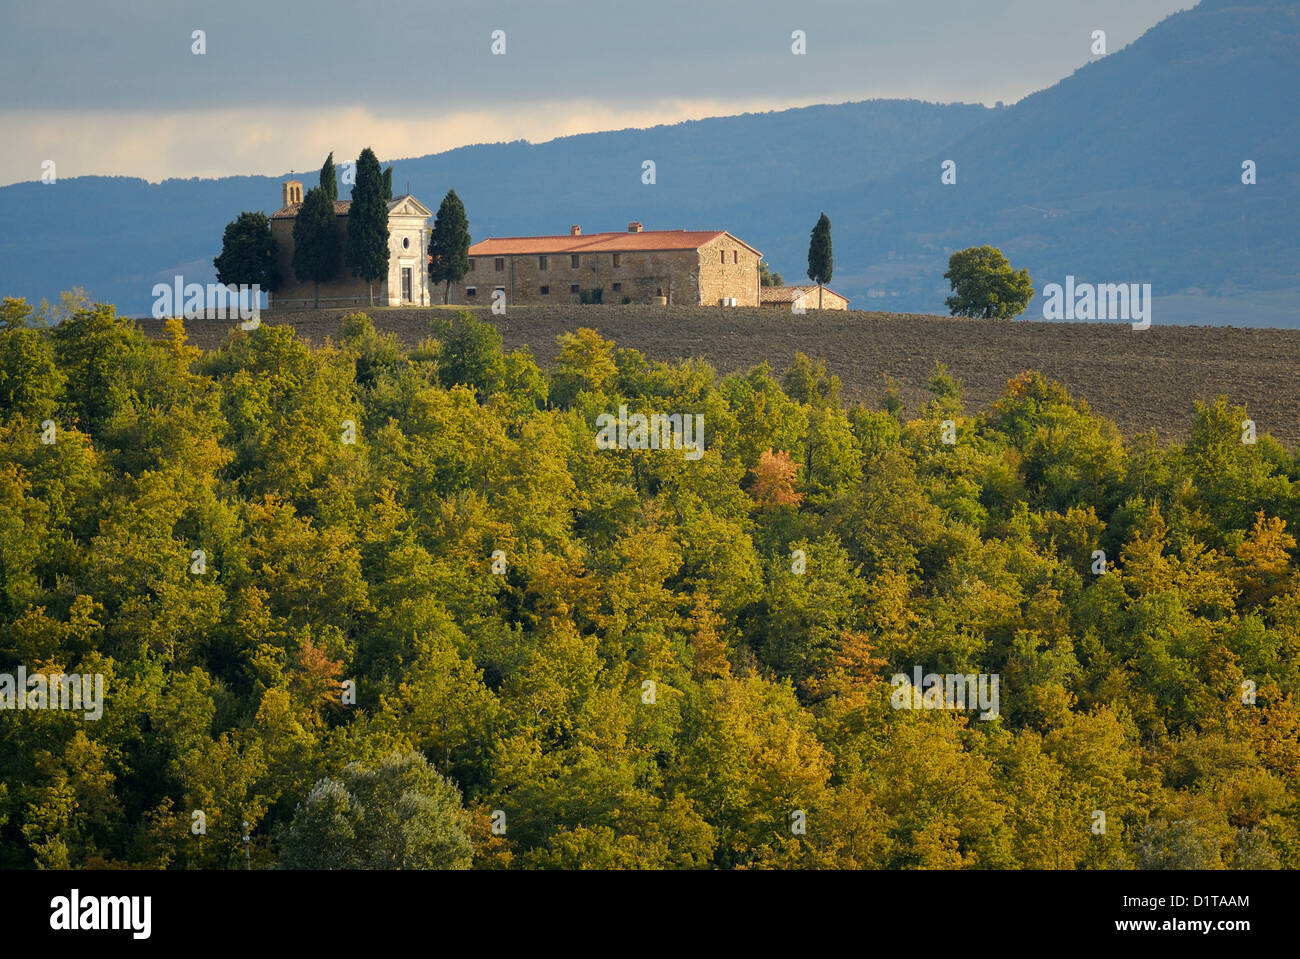 Vitaleta kleine Kirche, San Quirico d ' Orcia Val d ' Orcia Landschaften, Siena, Toskana, Italien Stockbild